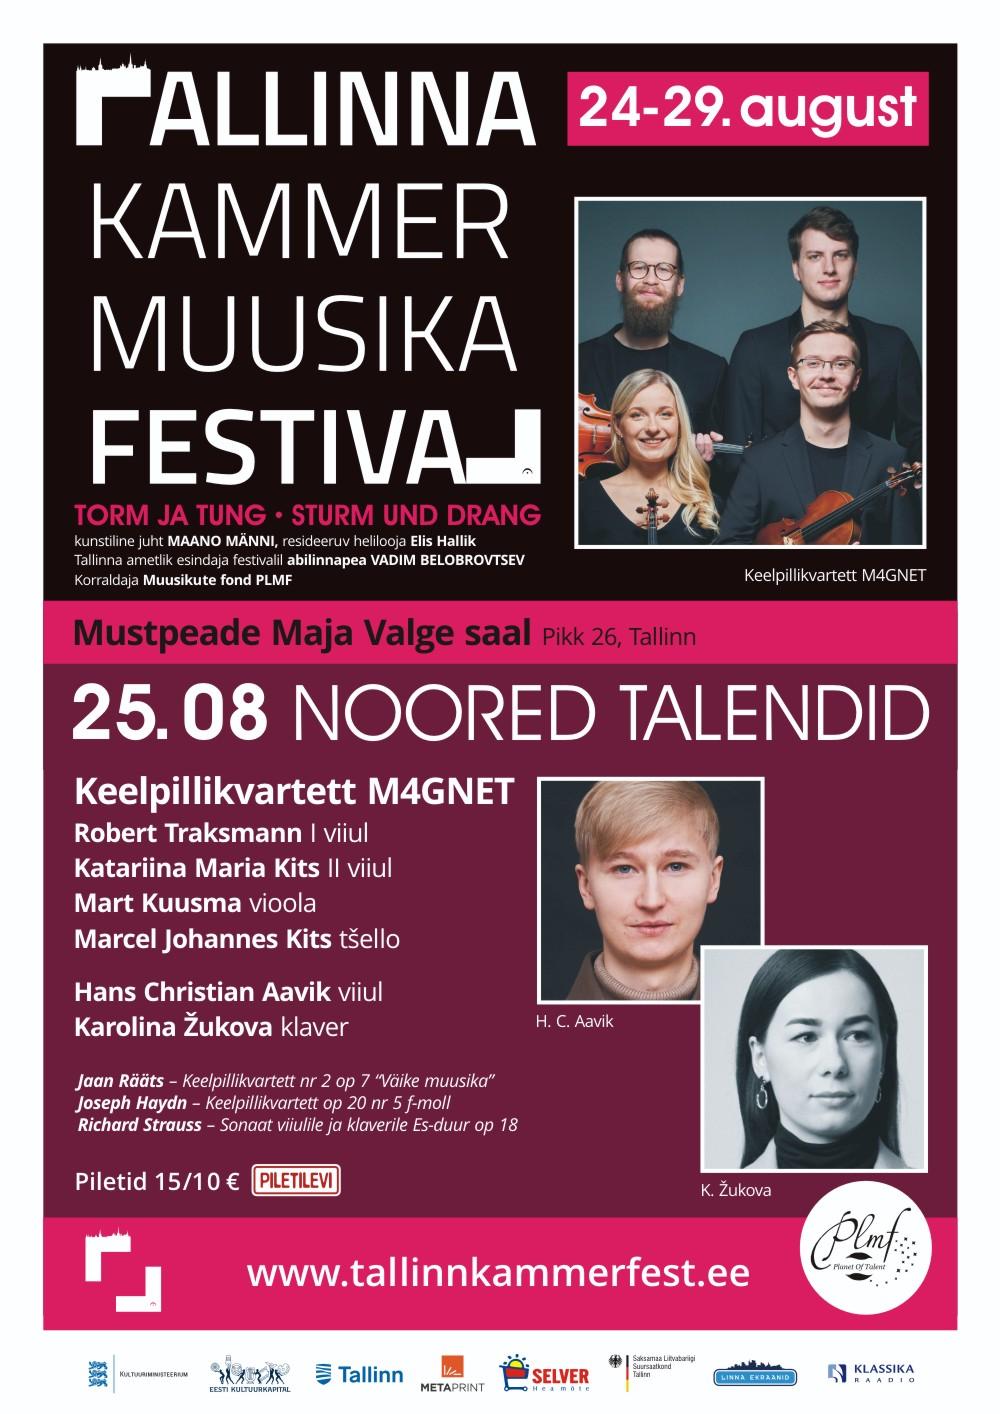 Keelpillikvartett M4GNET / Tallinna Kammermuusika Festival